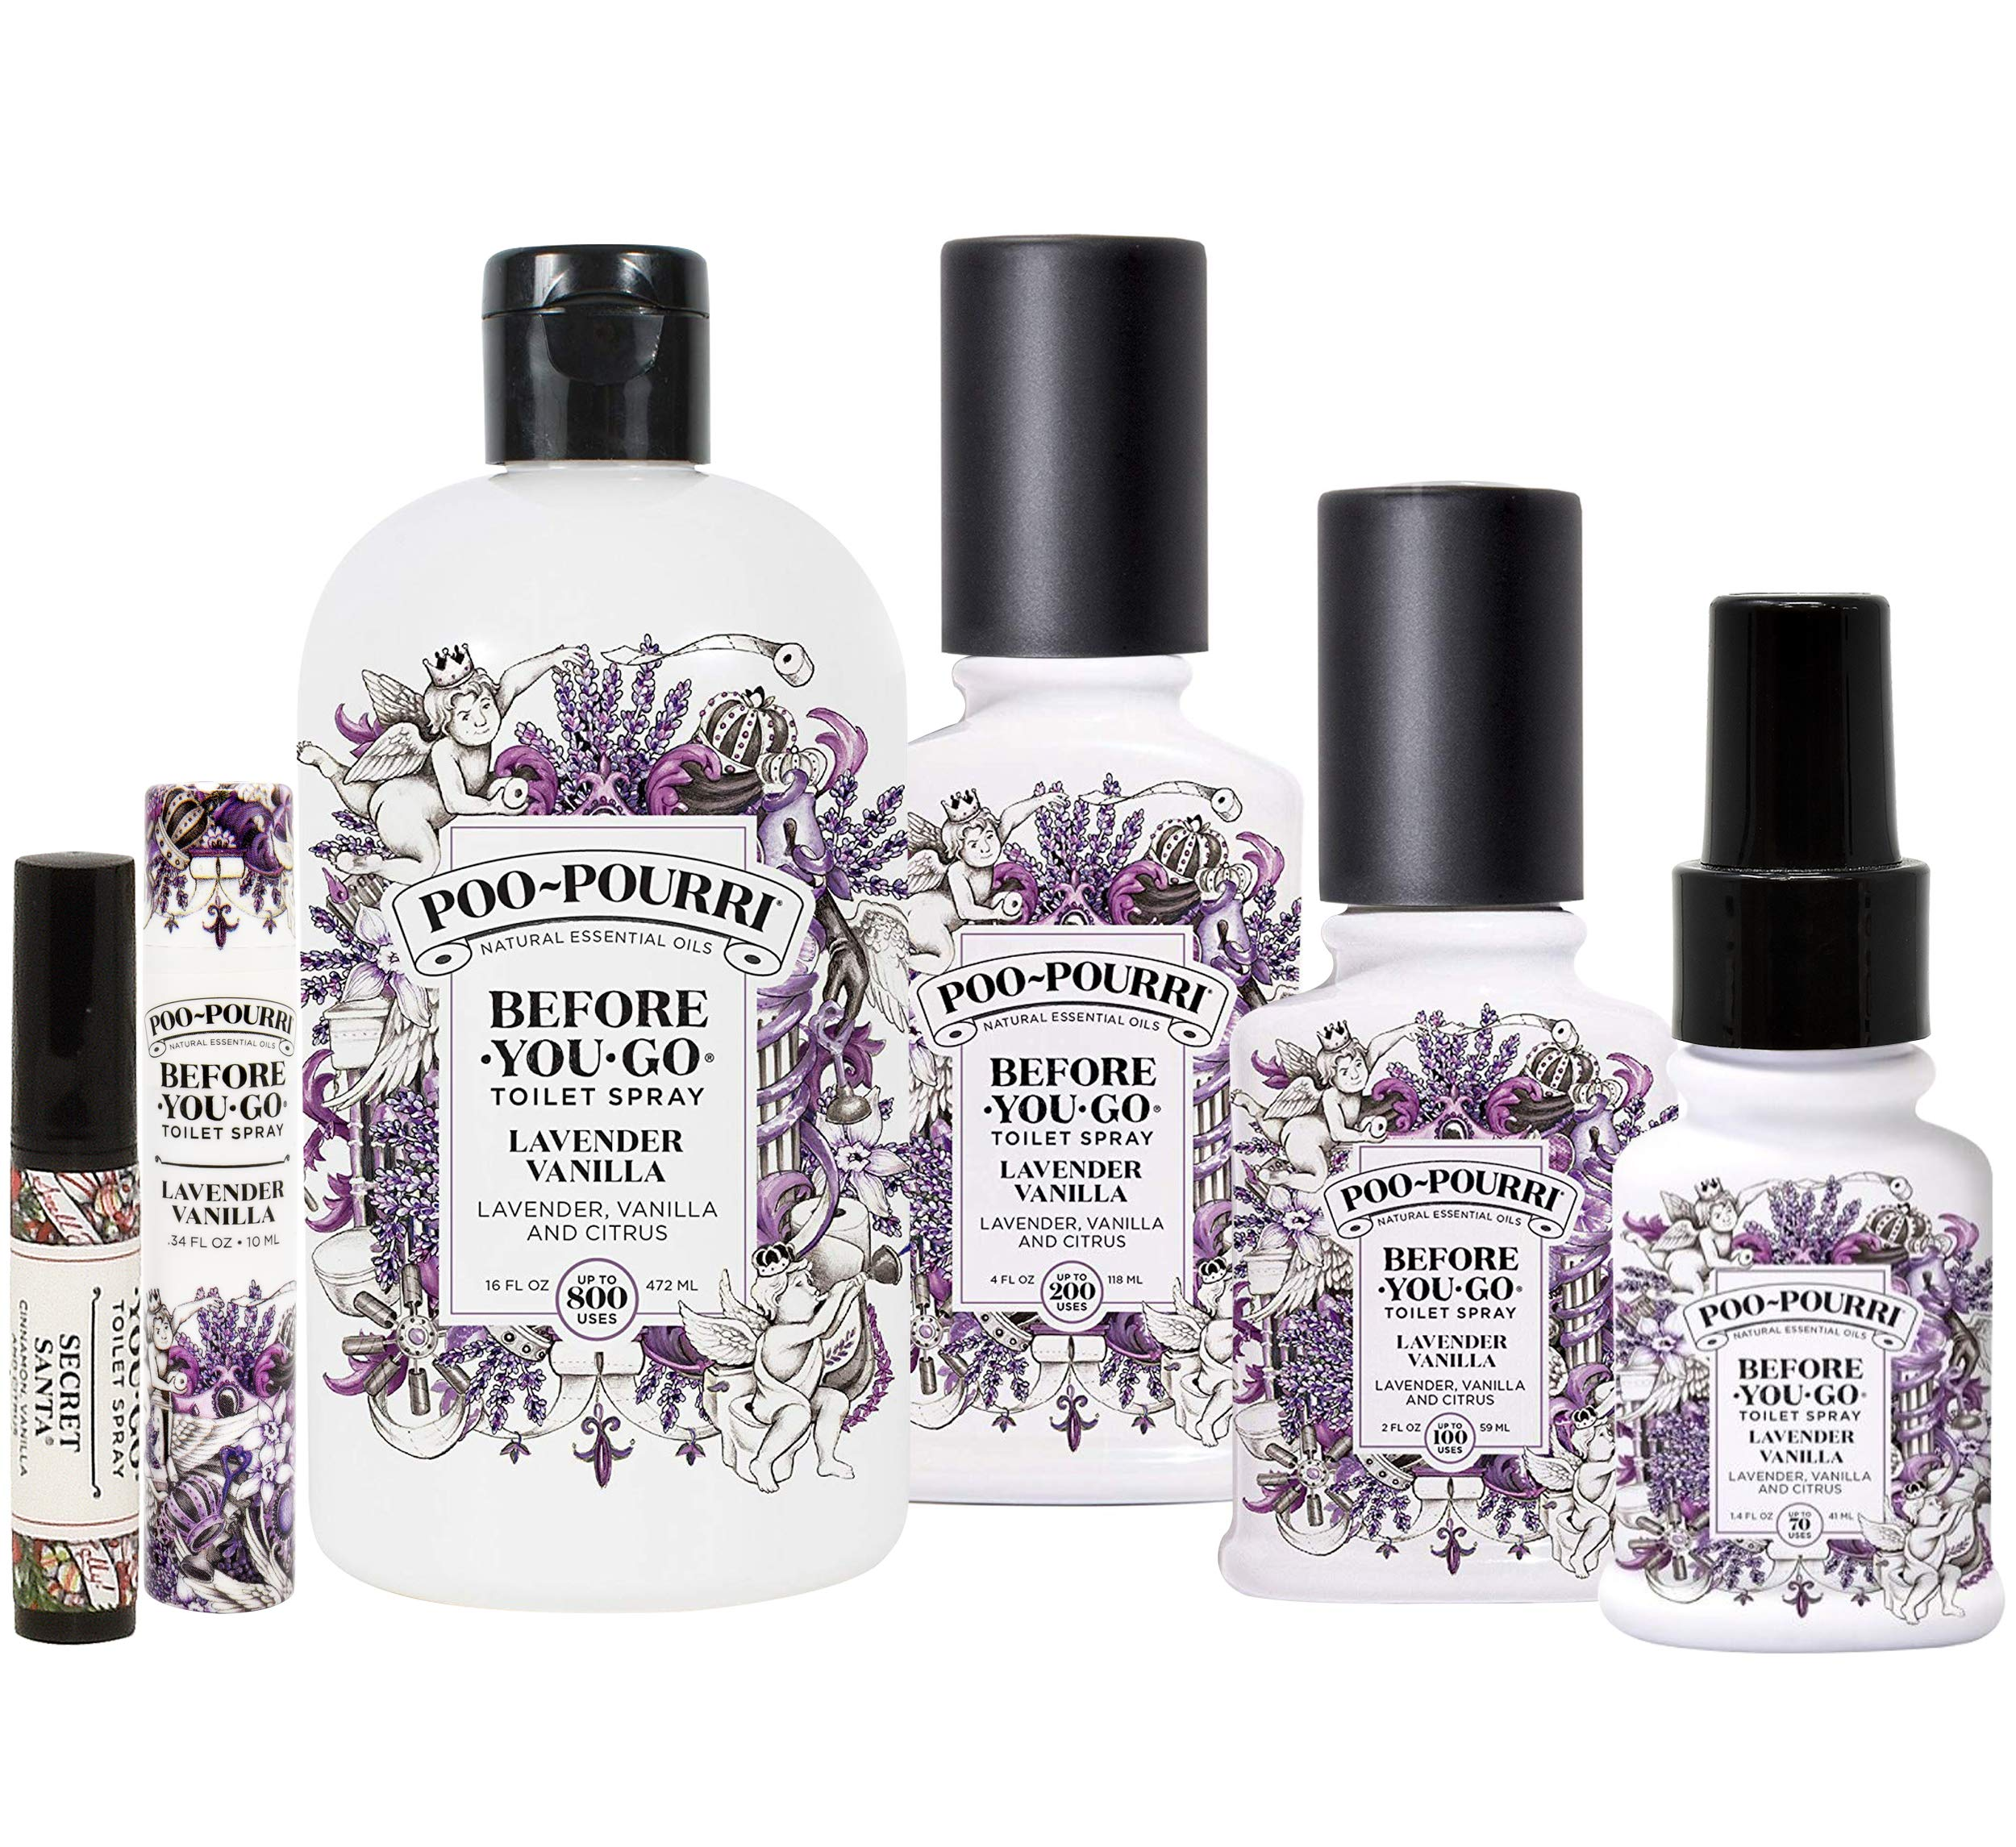 Poo-Pourri Lavender Vanilla Collection Includes 16 Ounce Refill, 4 Ounce, 2 Ounce, 1.4 Ounce, 10mL and Secret Santa Travel Size Spritzer by Poo-Pourri